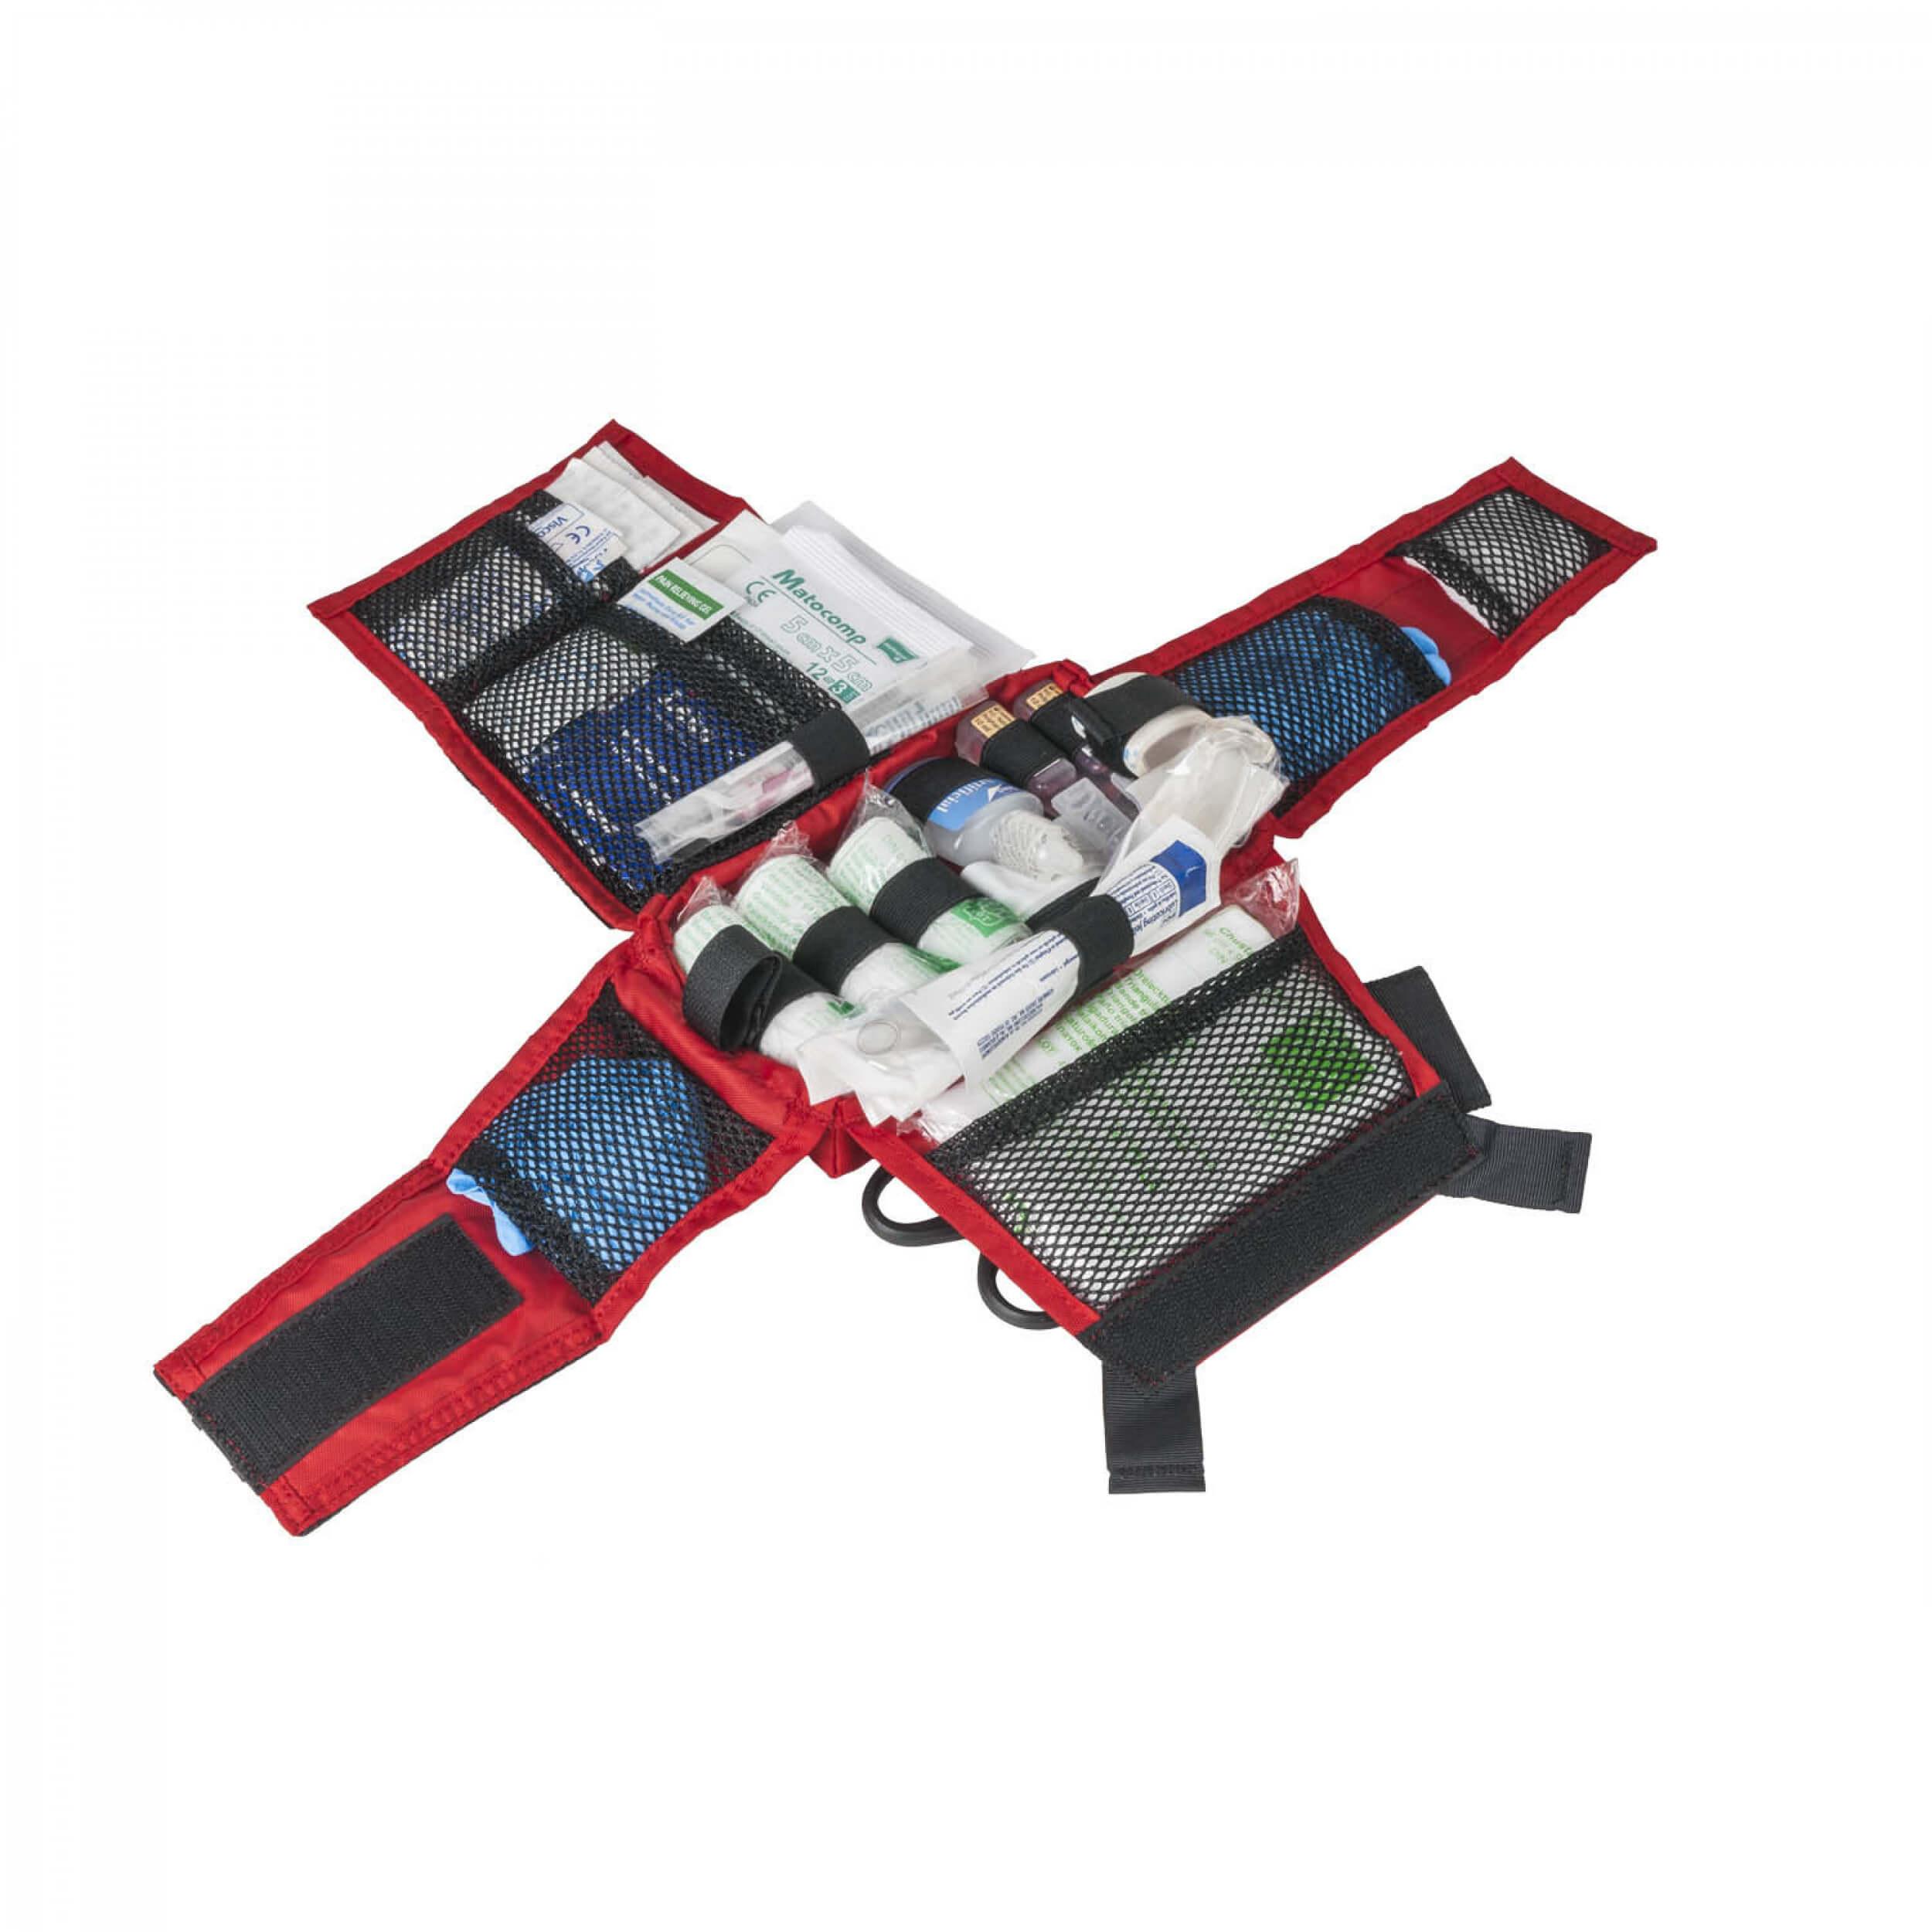 Helikon-Tex Modular Individual Med Kit Pouch -Cordura- Kryptek Highlander